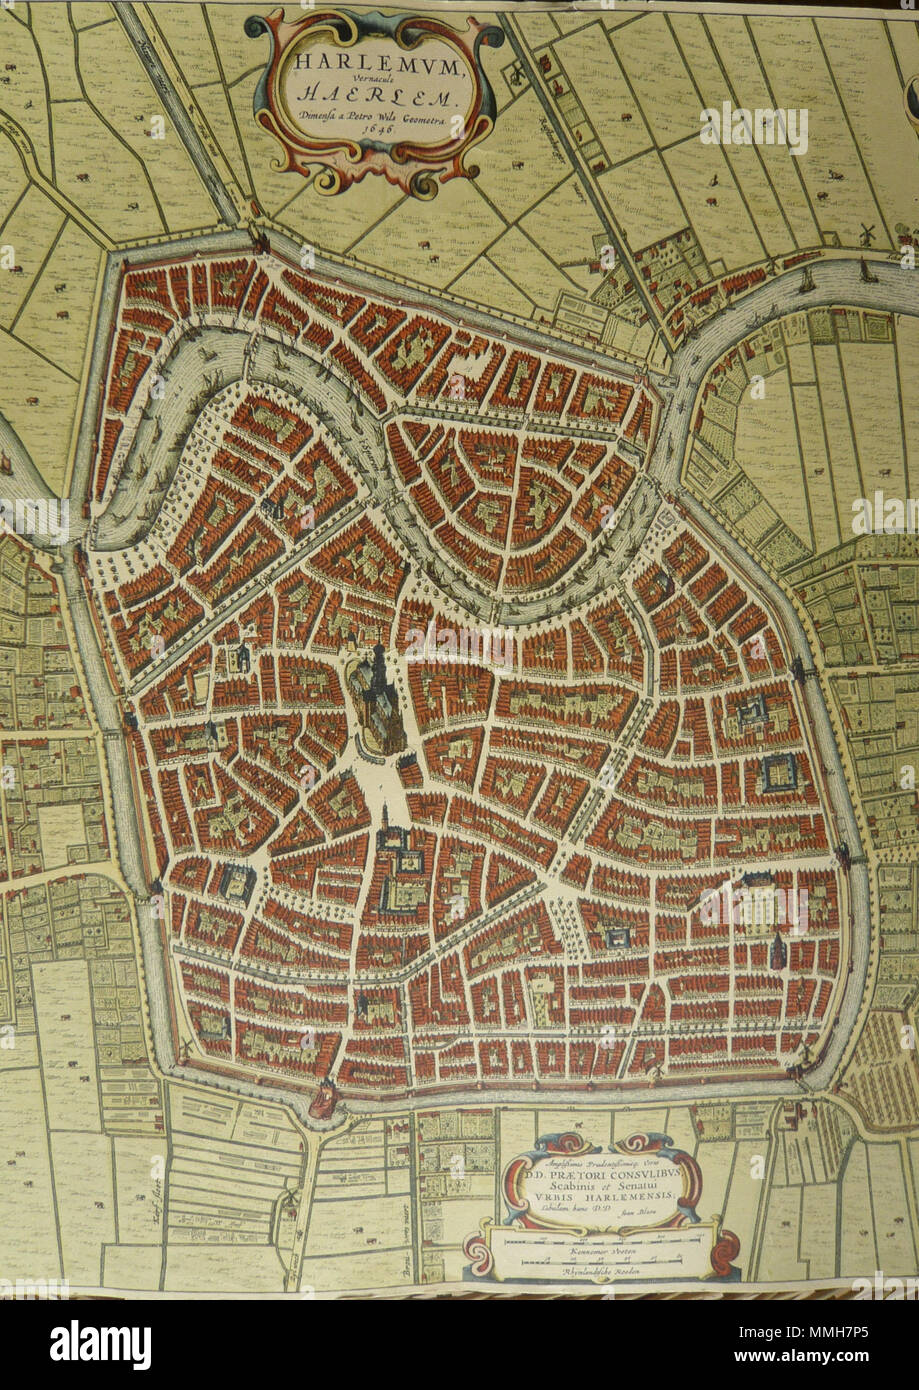 Map Of Haarlem Stockfotos & Map Of Haarlem Bilder - Alamy